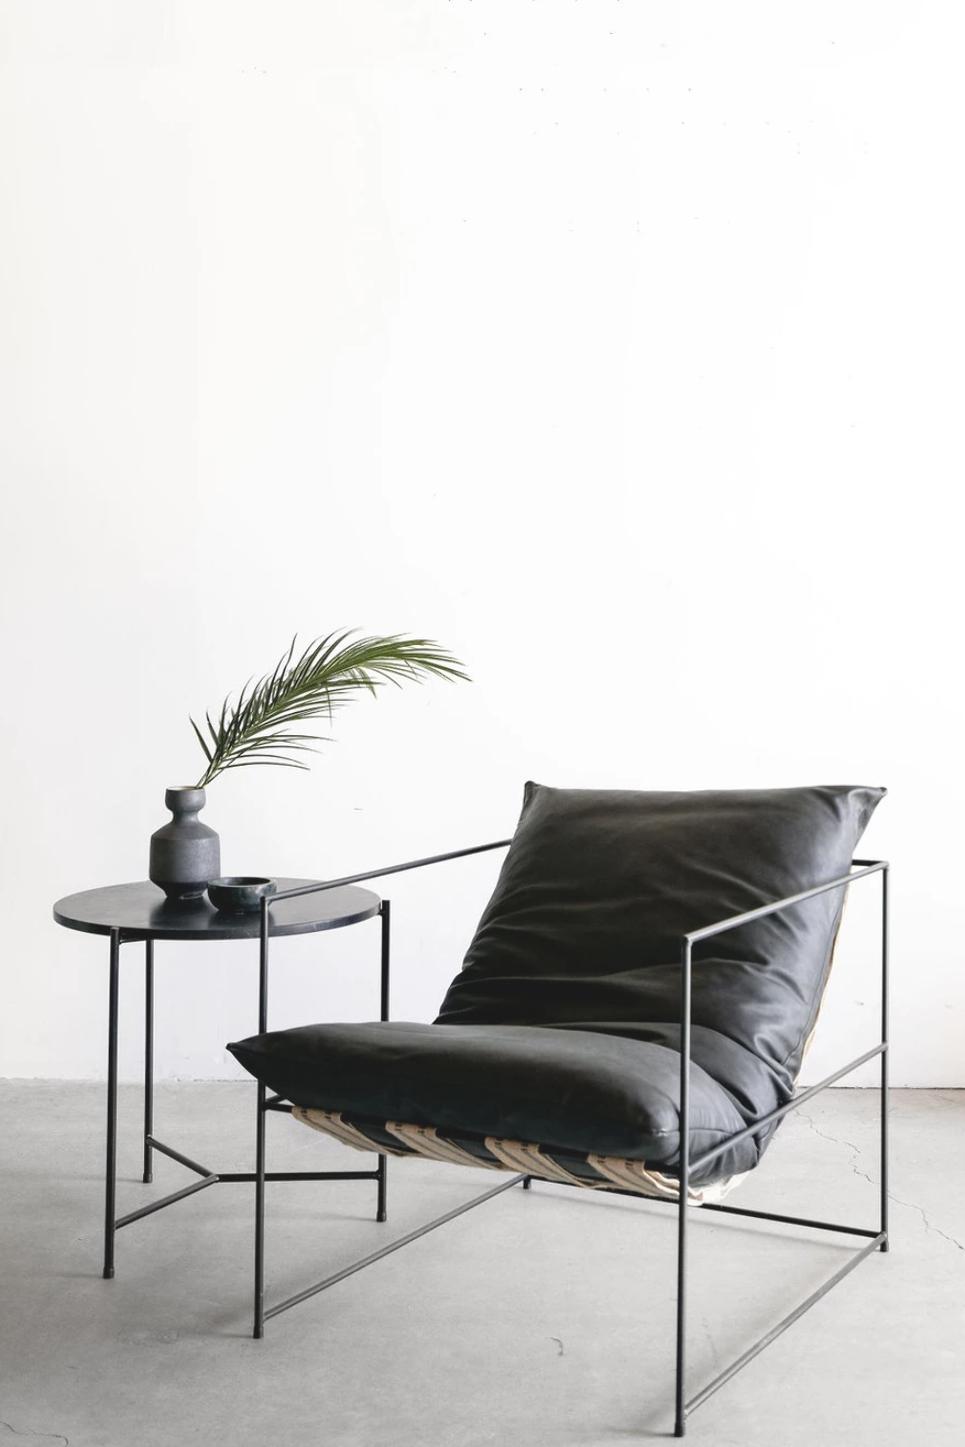 Leather Sierra Chair Croft House Design Studio La California Croft House Em 2020 Poltronas Sala De Estar Moveis De Aco Moveis